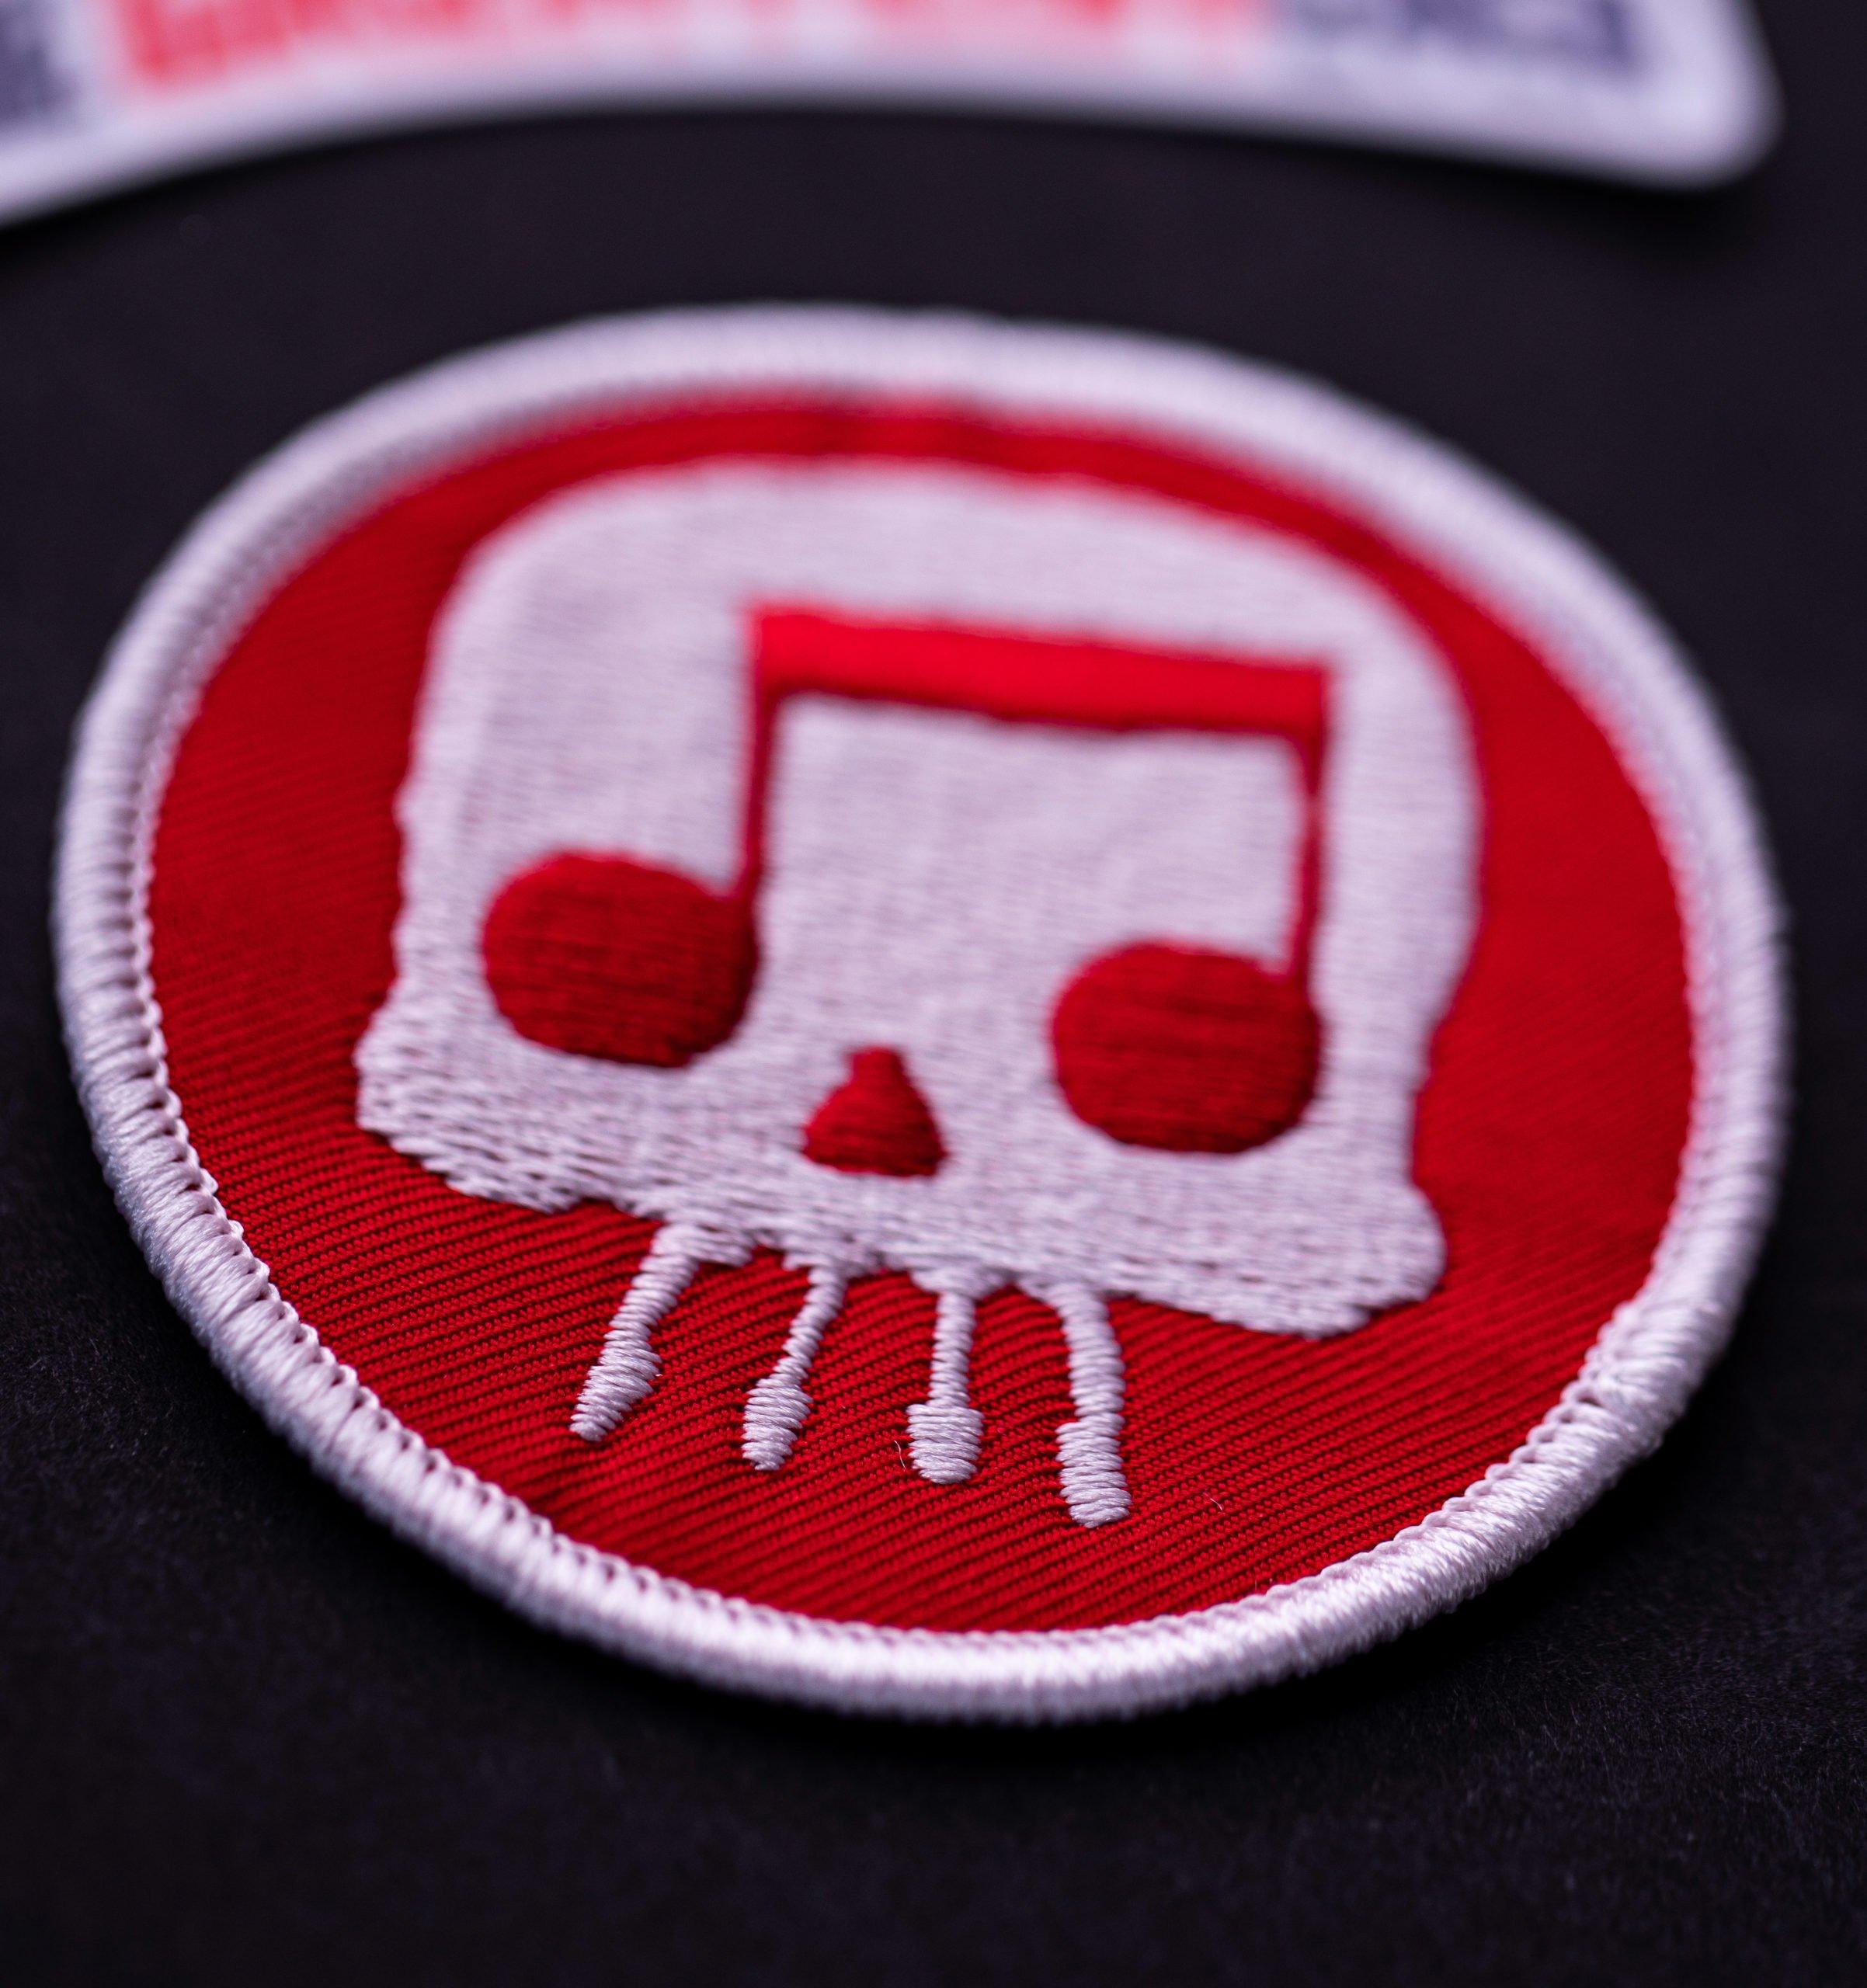 JT Music Patch